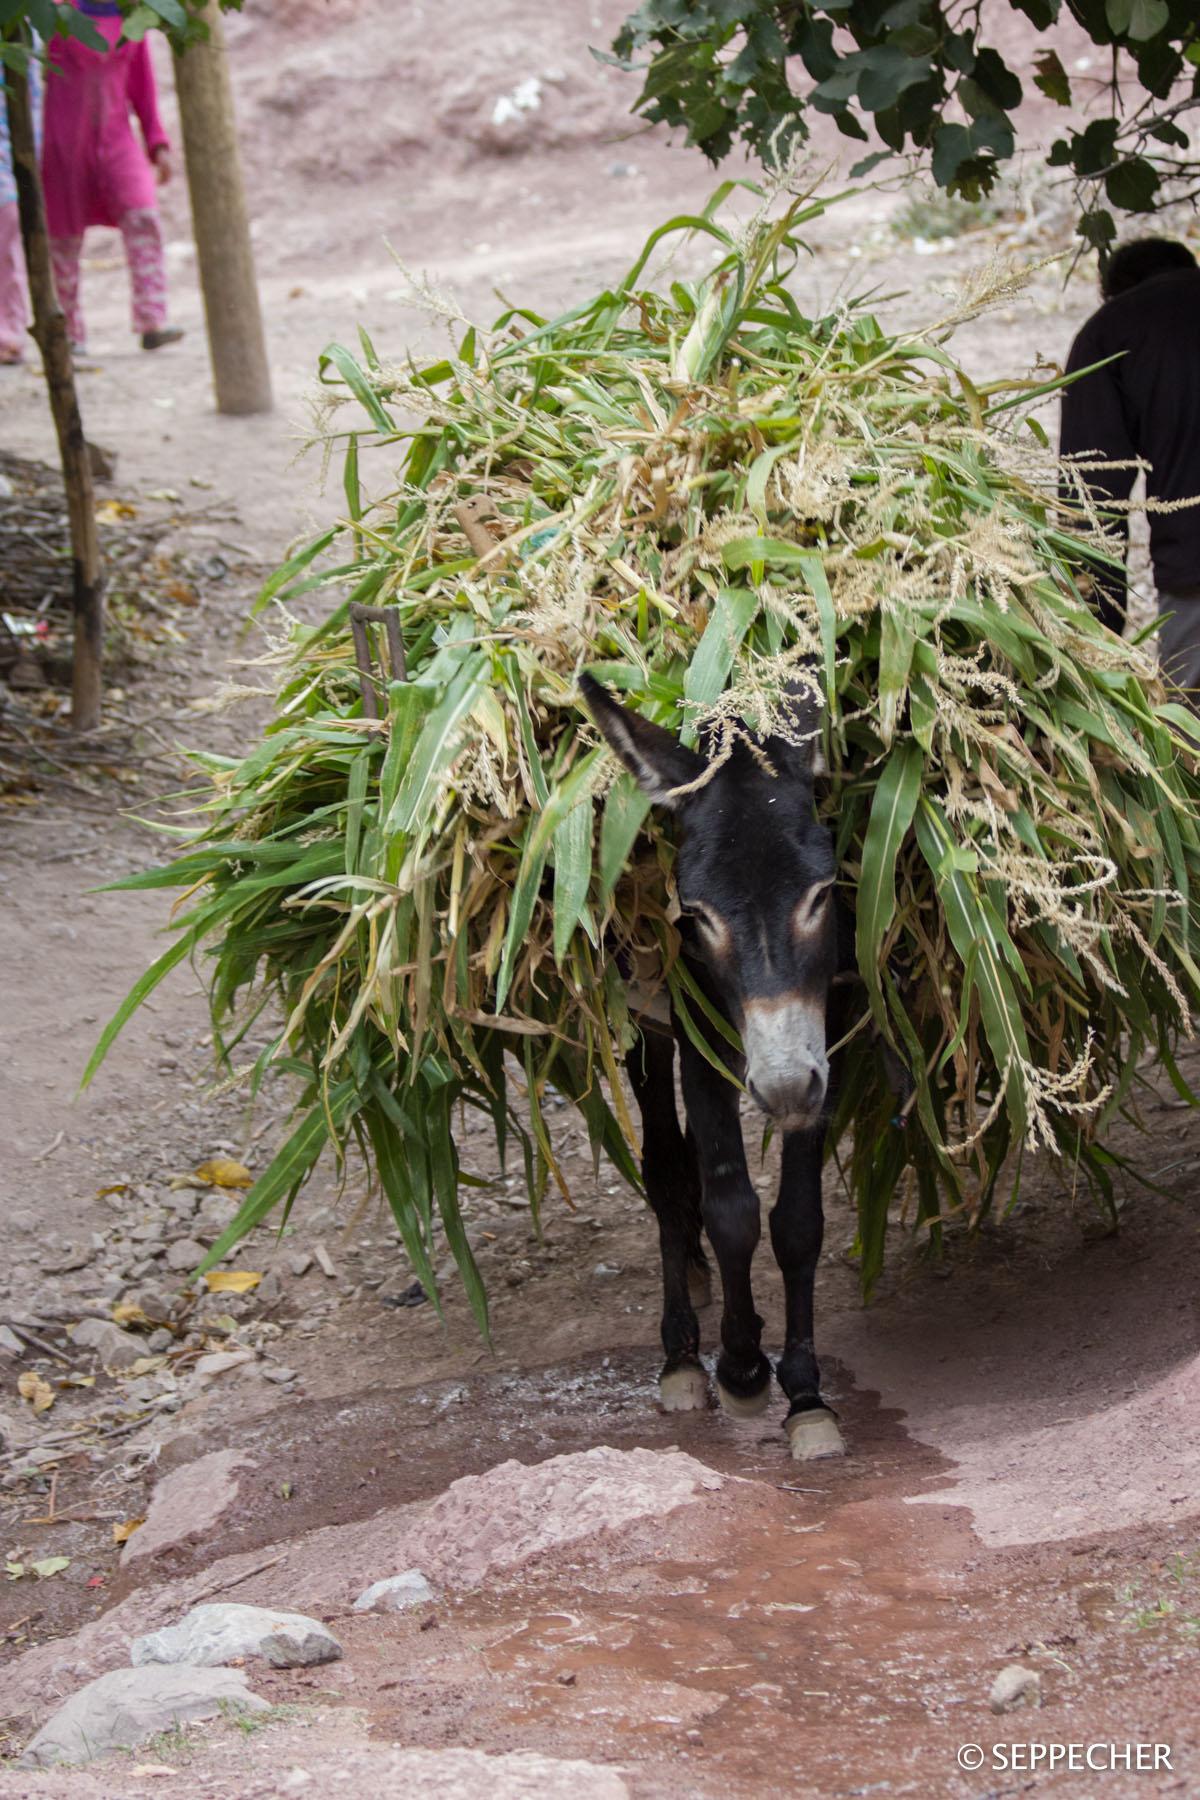 L'âne camouflage.